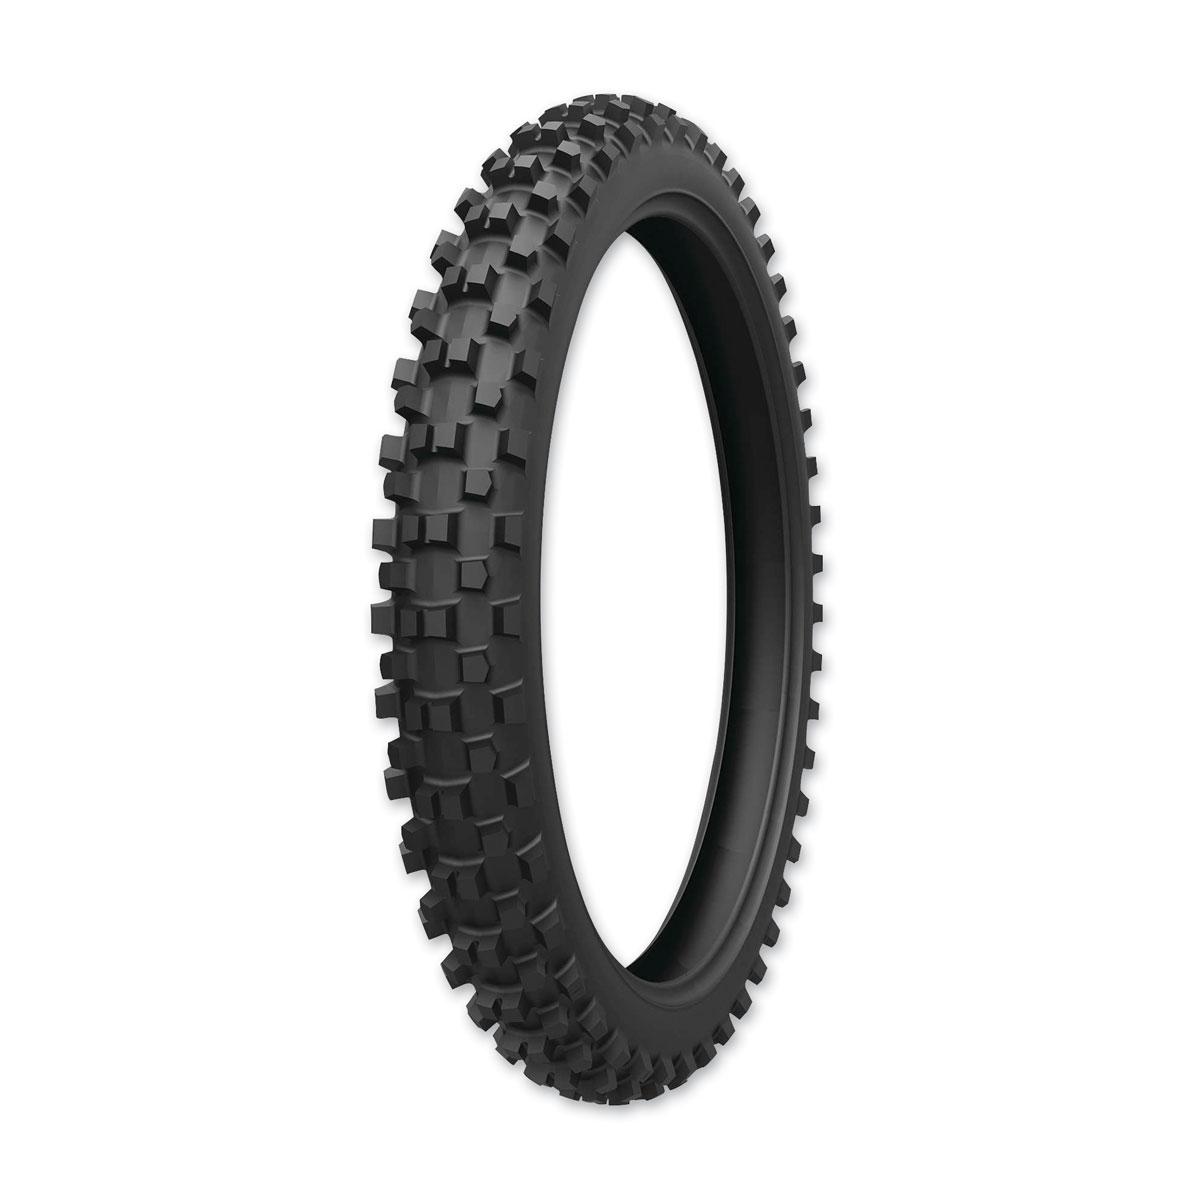 Kenda Tires Washougal II 2.50-12 Front Tire